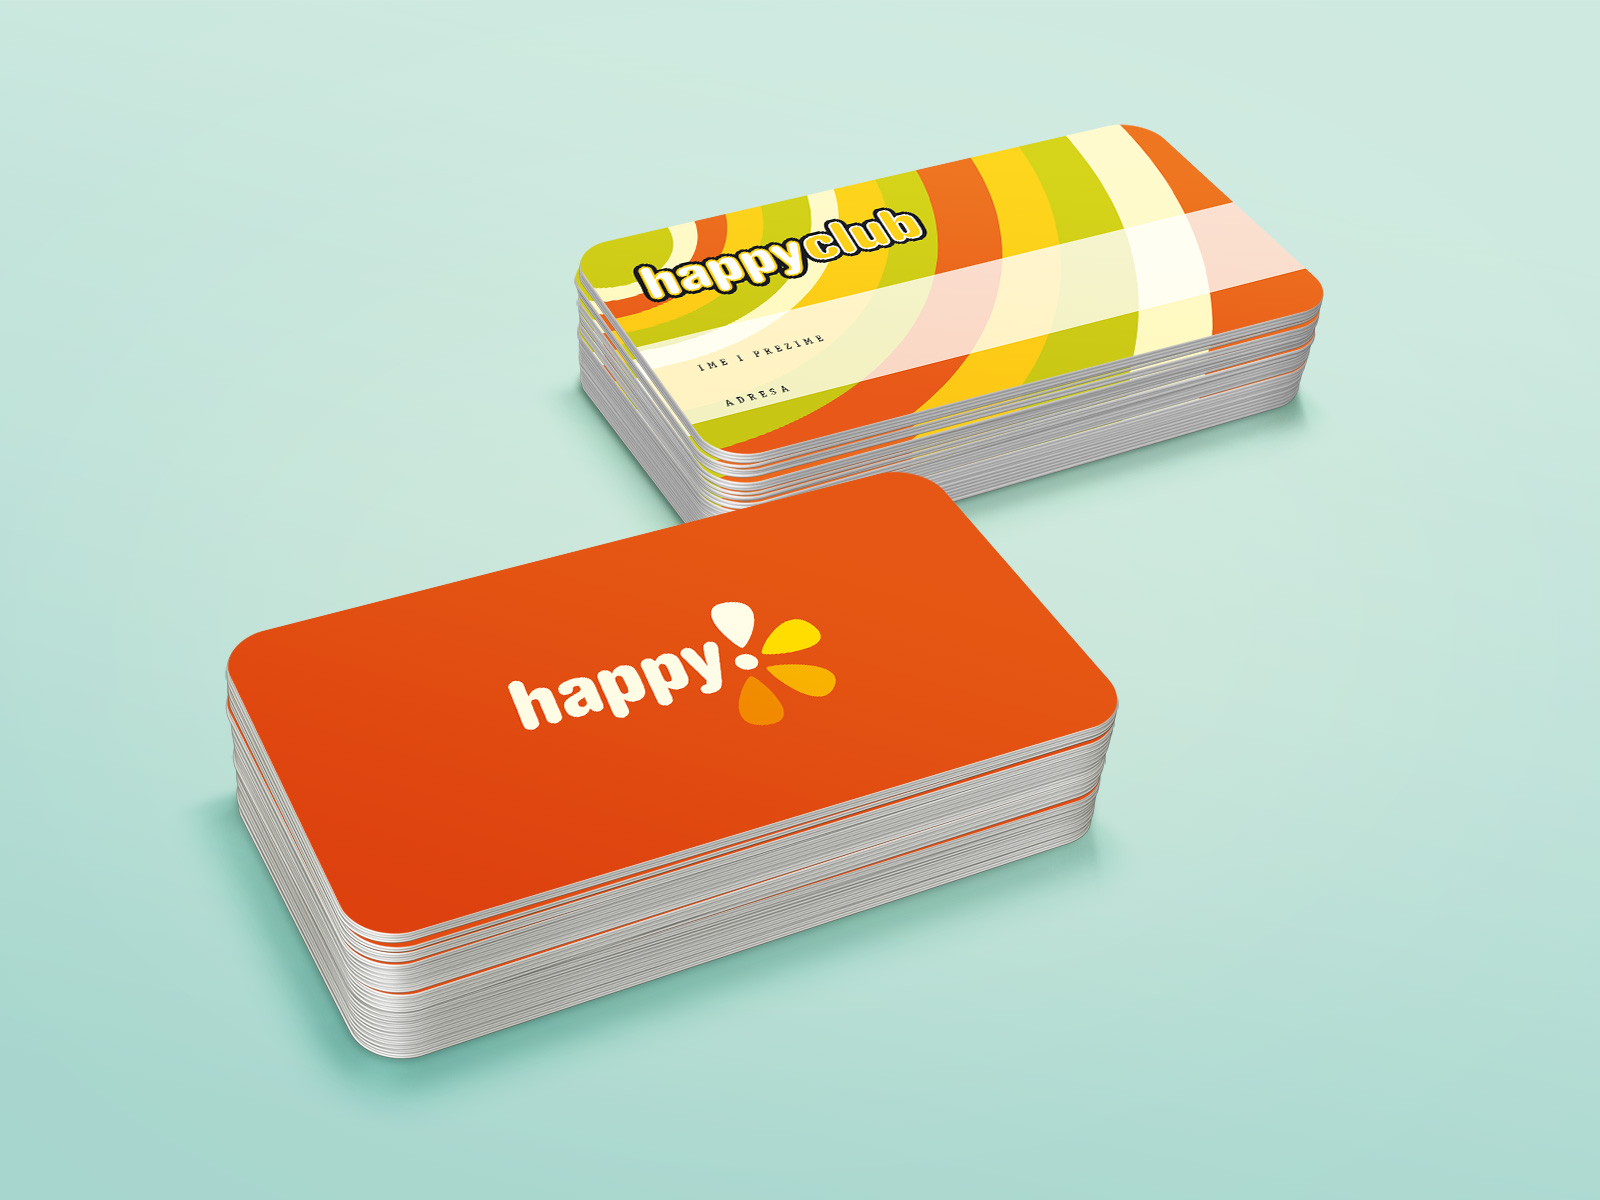 Happy tv studio card